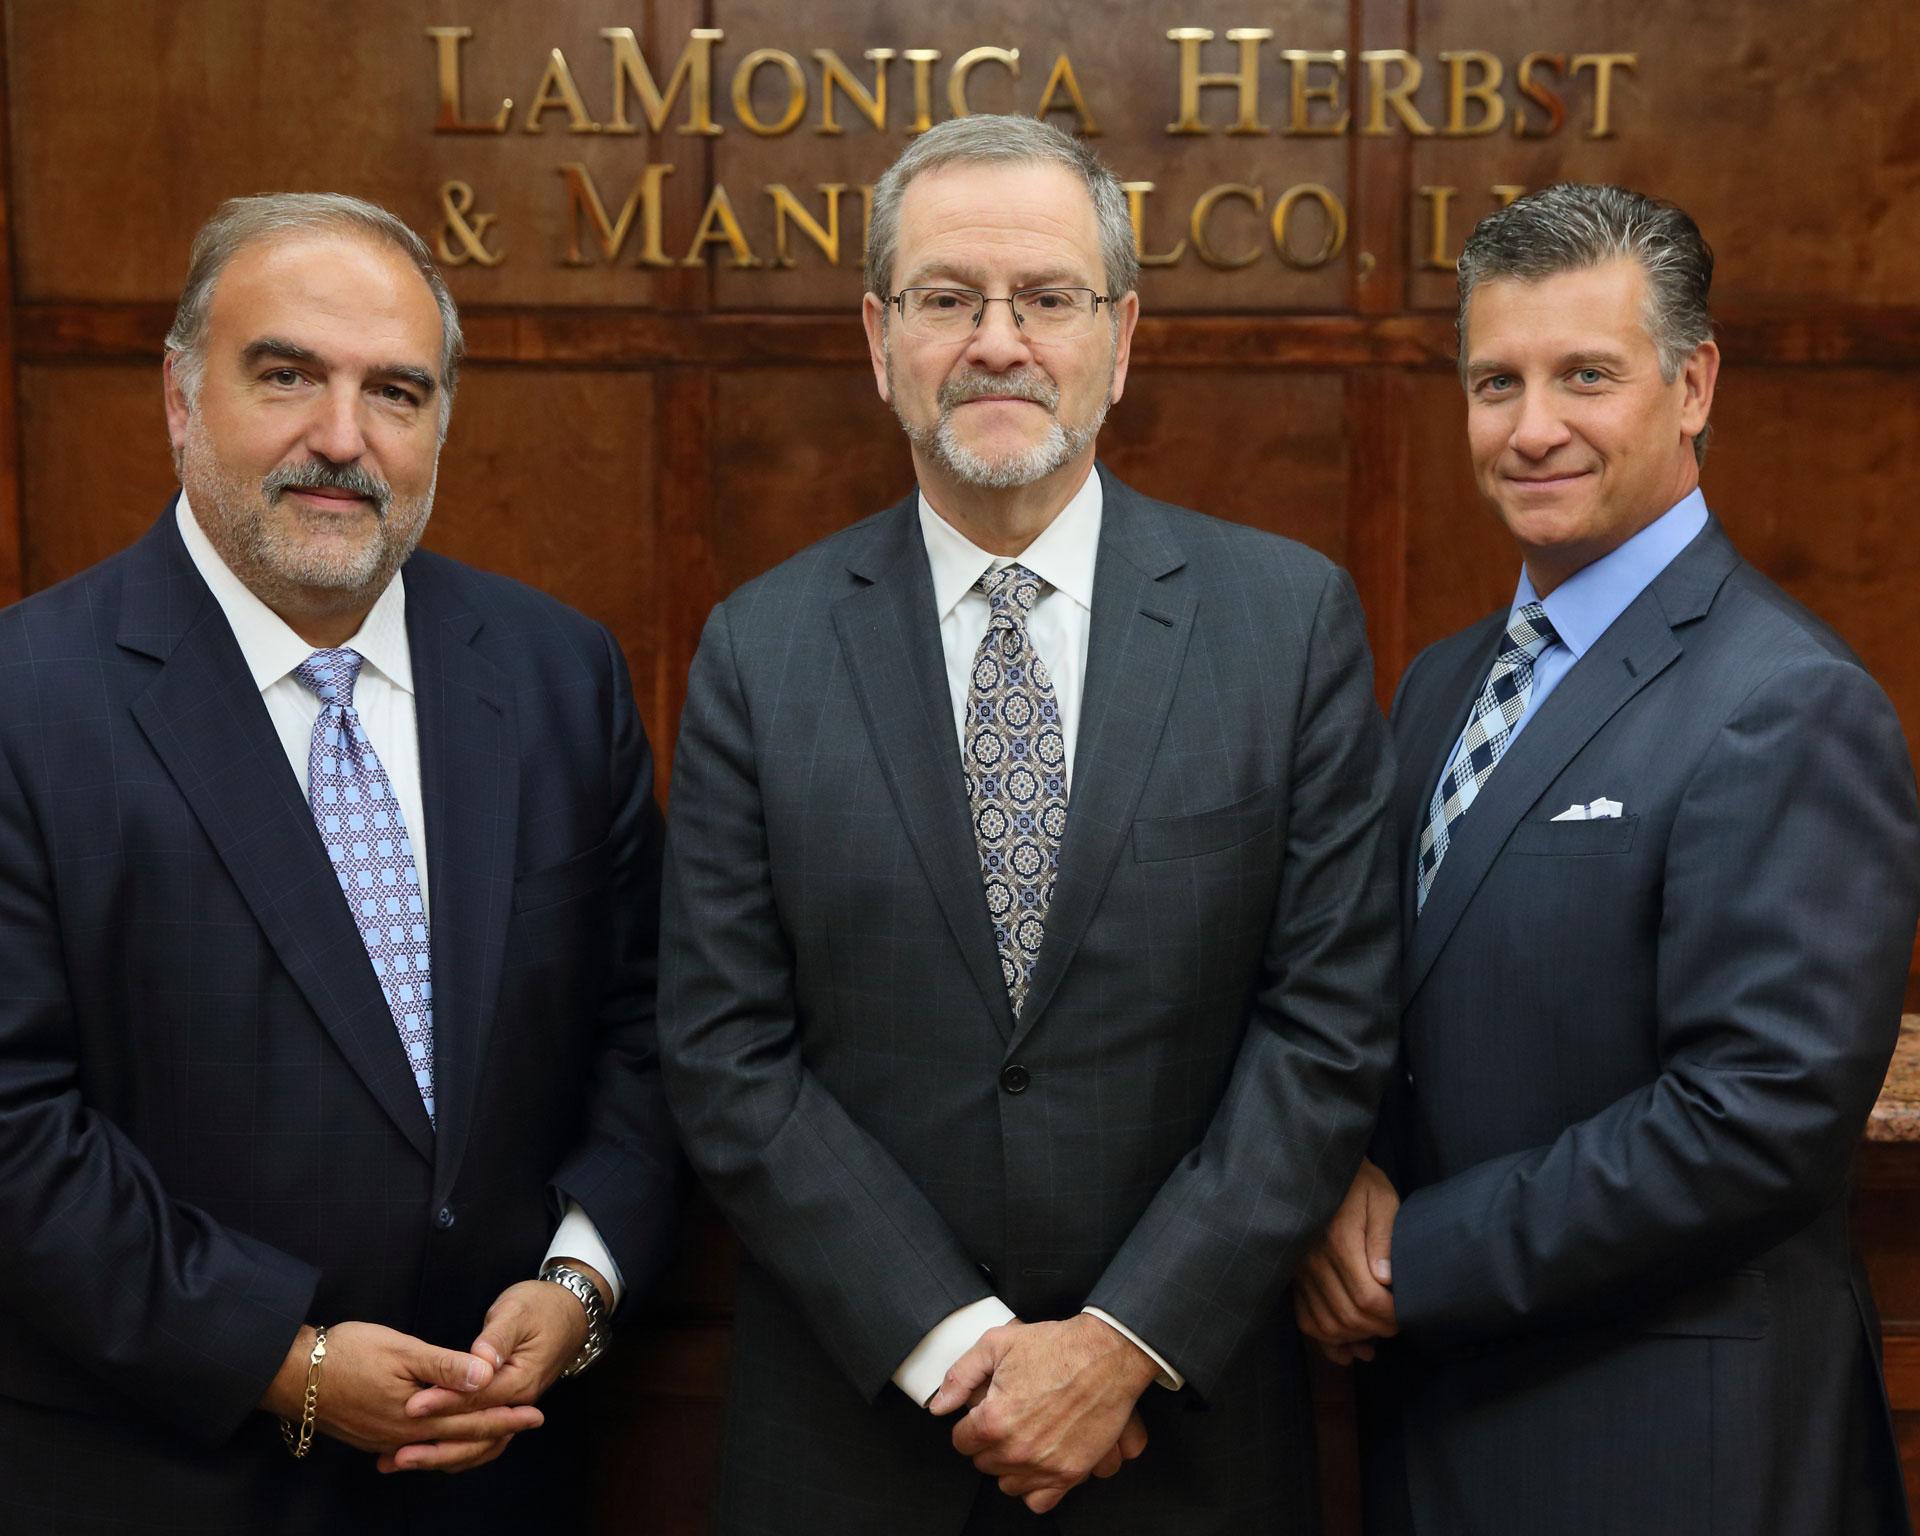 LH&M founding partners